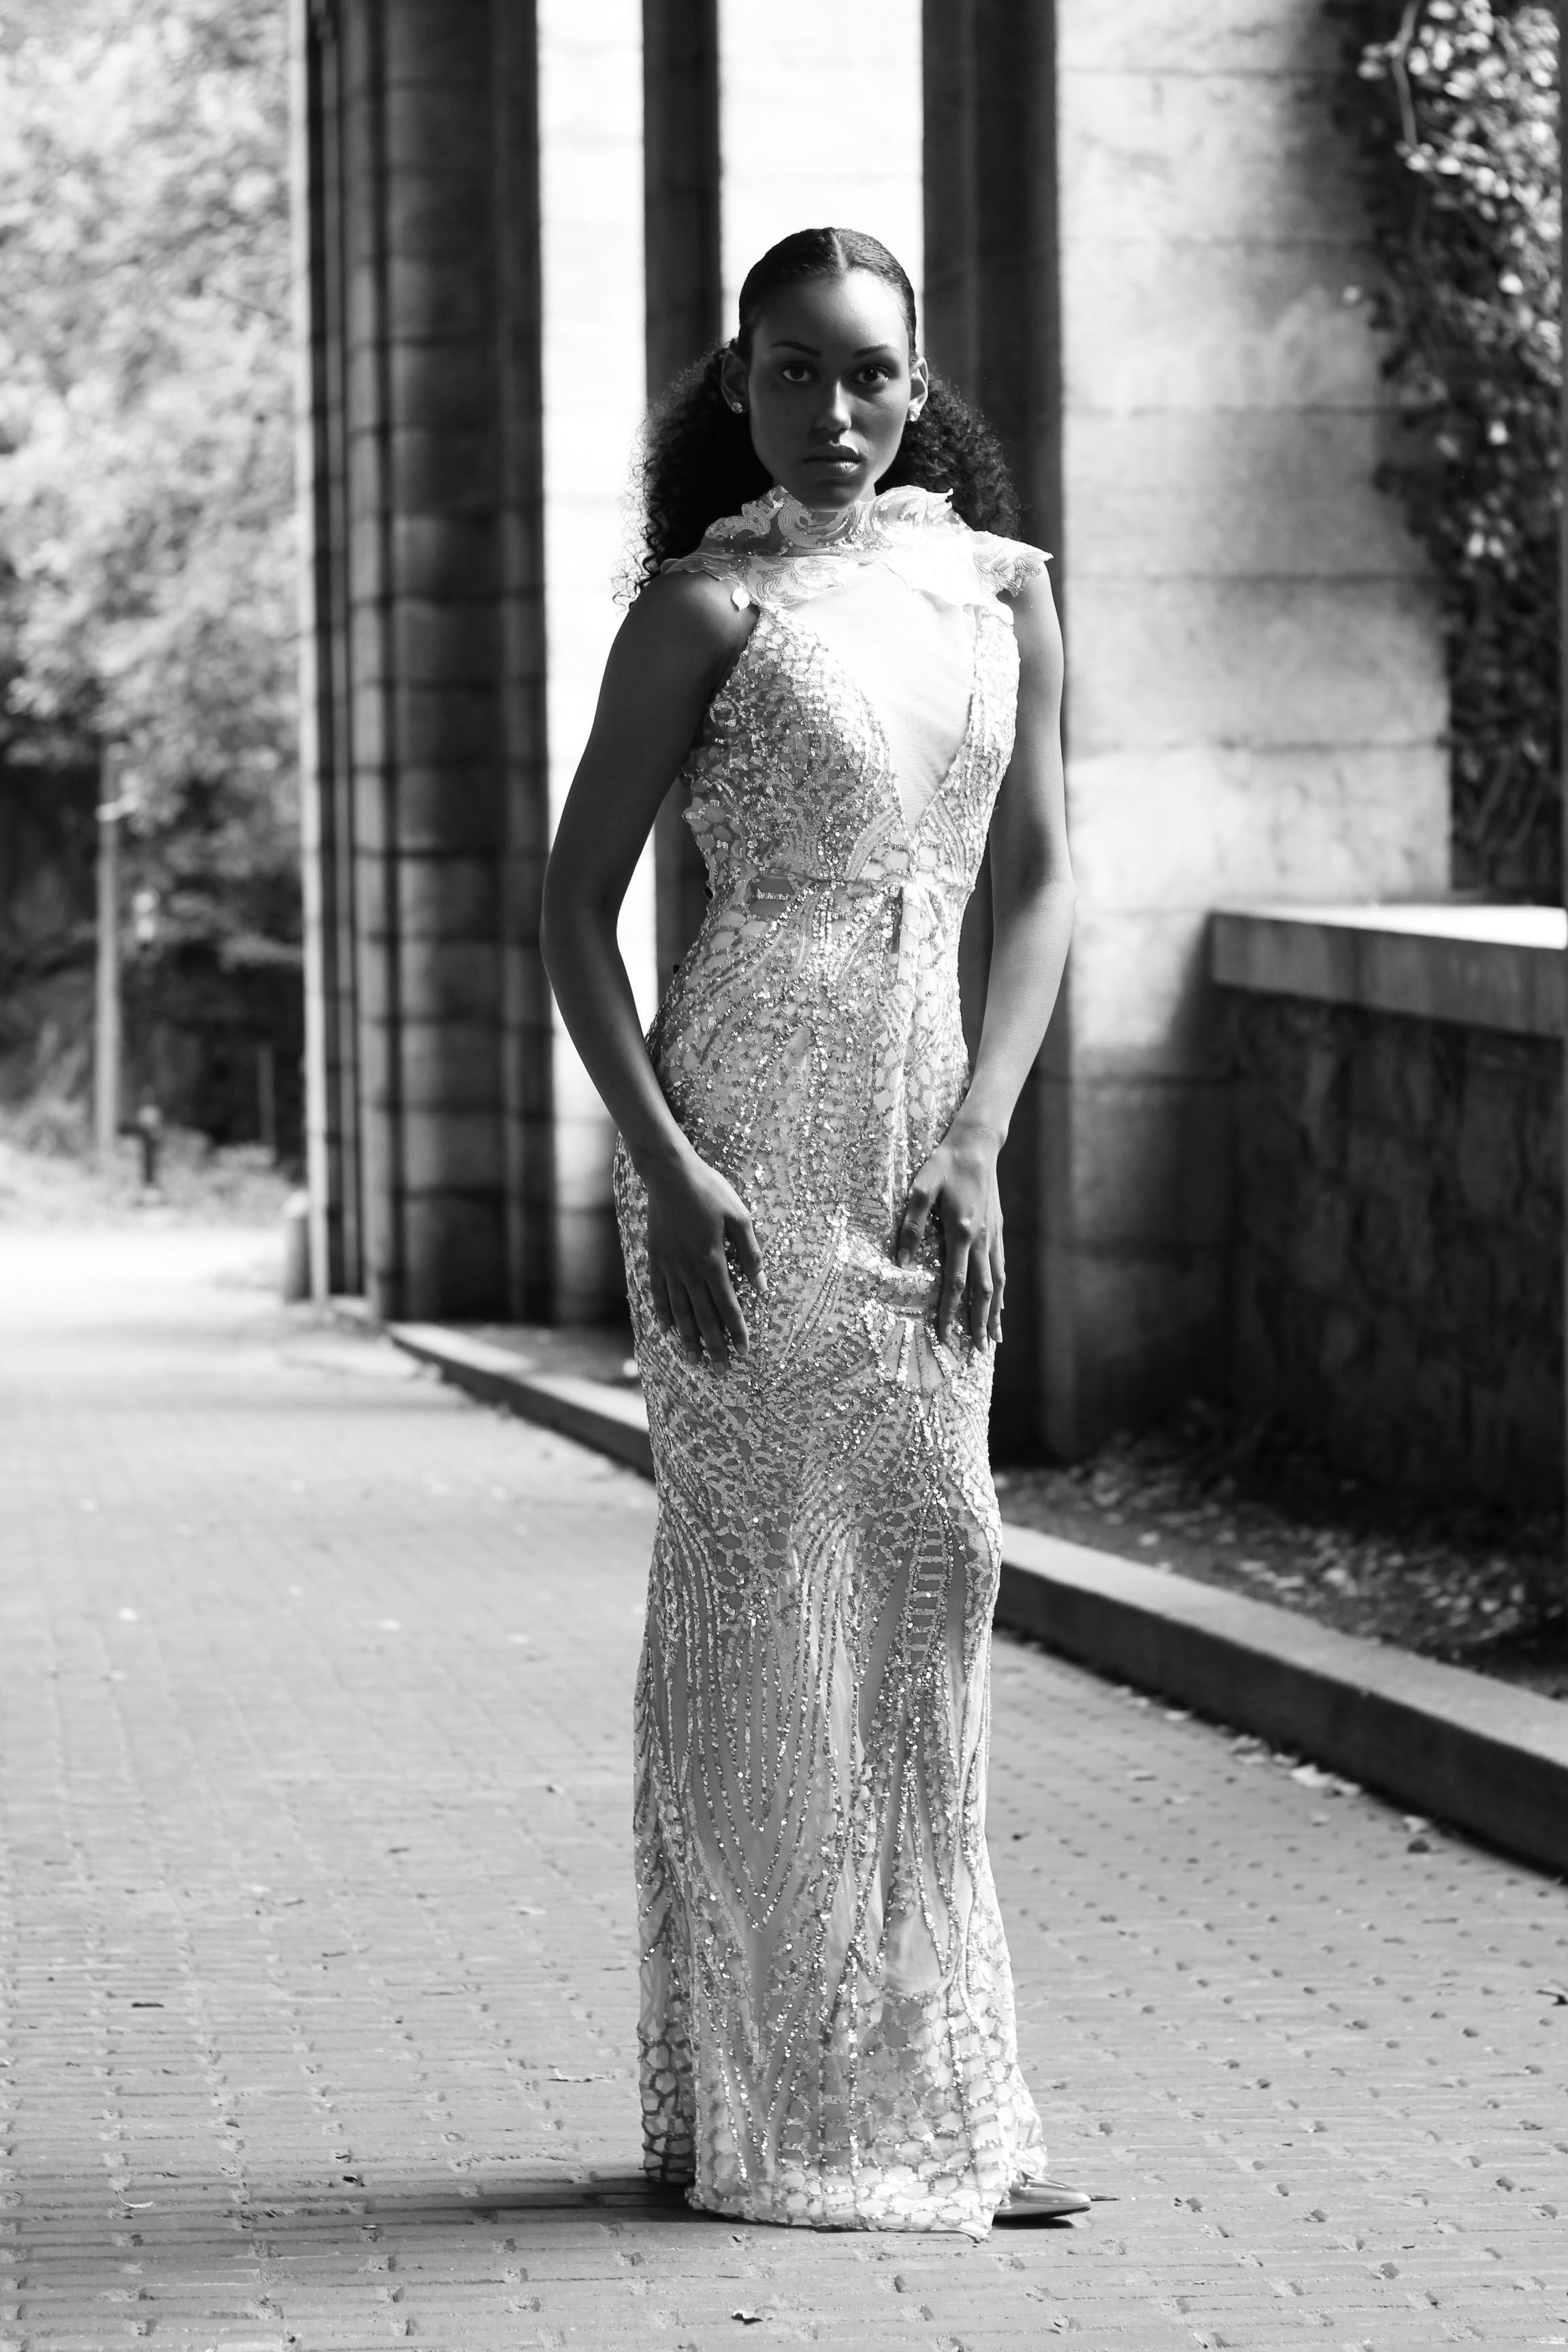 bw silver gown.jpg